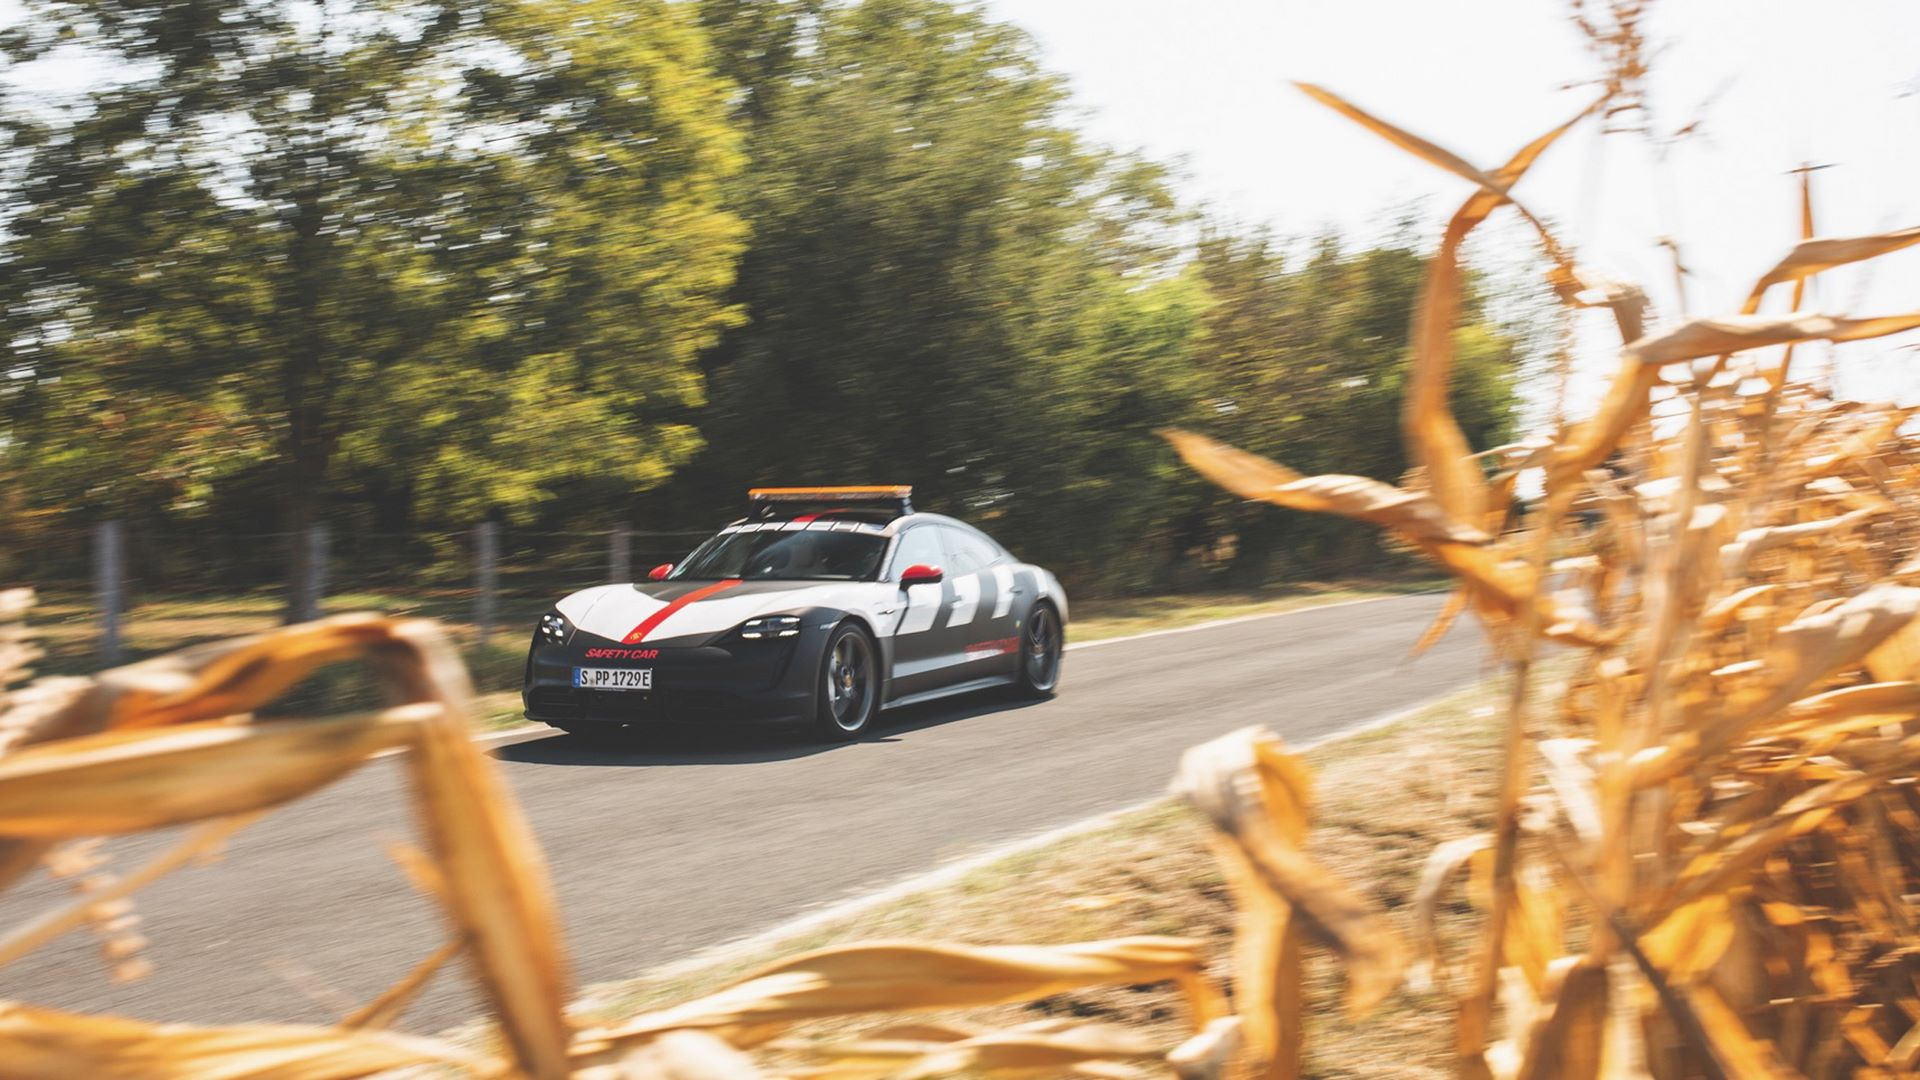 Porsche-Taycan-Turbo-safety-car-Le-Mans-2020-13